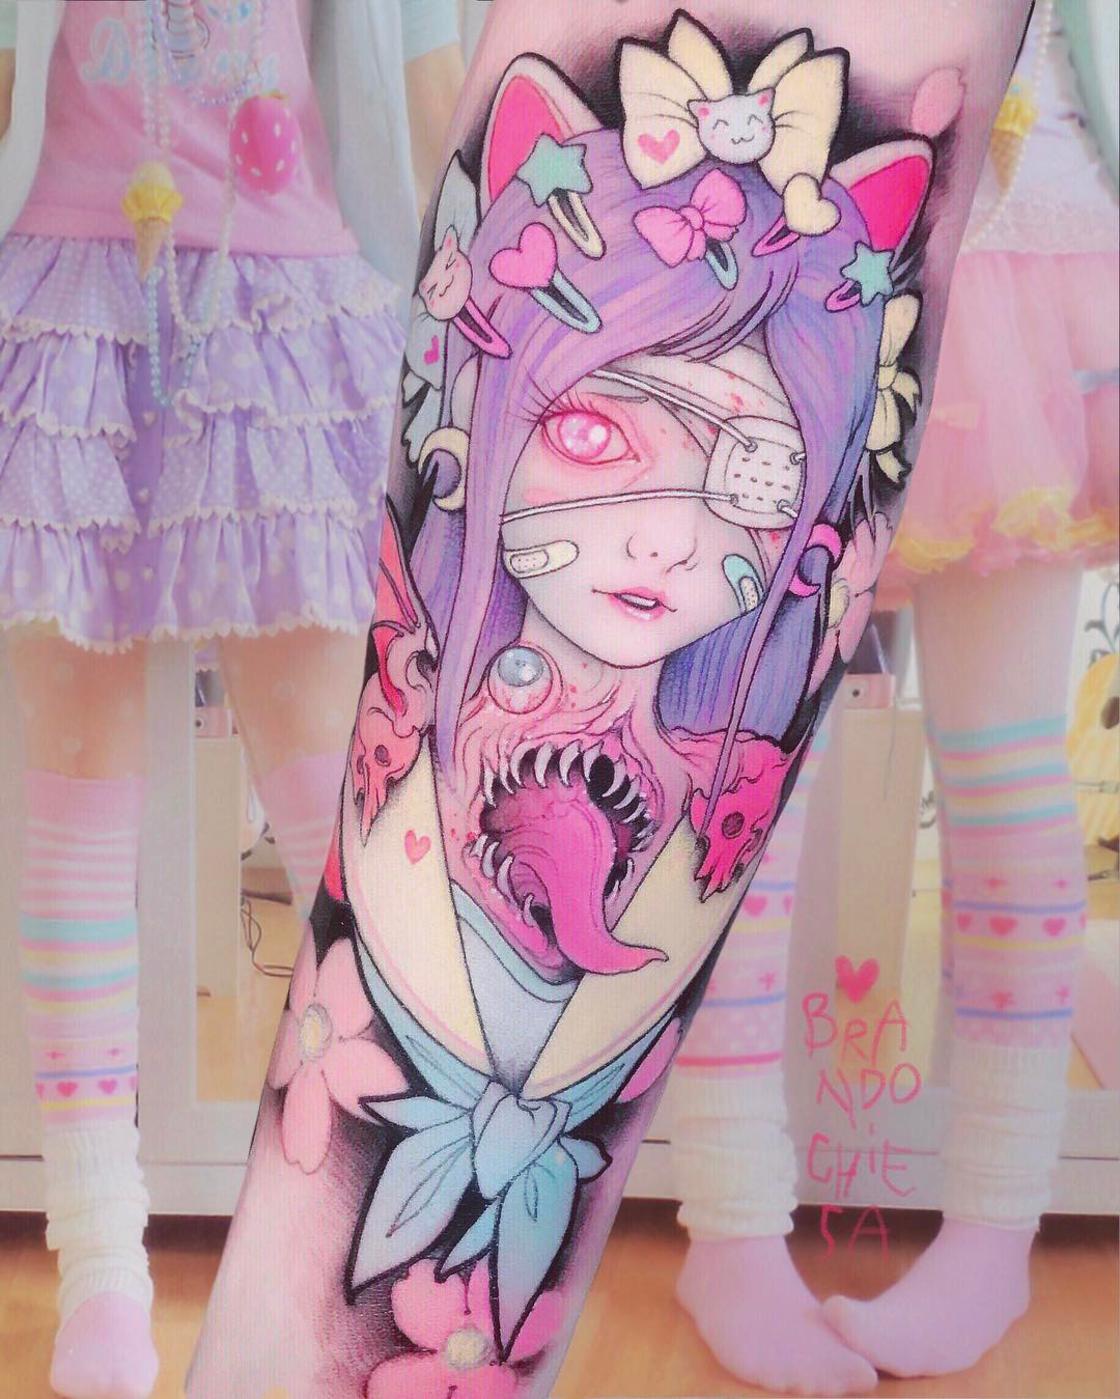 pink-gore-tattoos-brando-chiesa-2.jpg